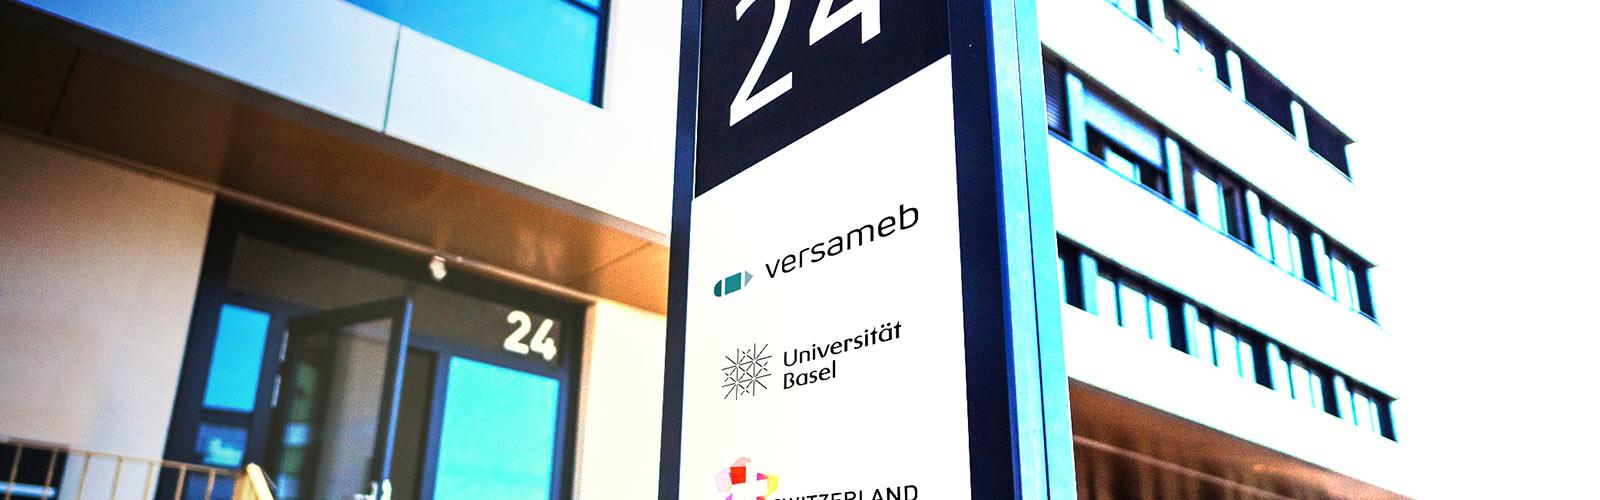 Company_Versameb_Basel-2